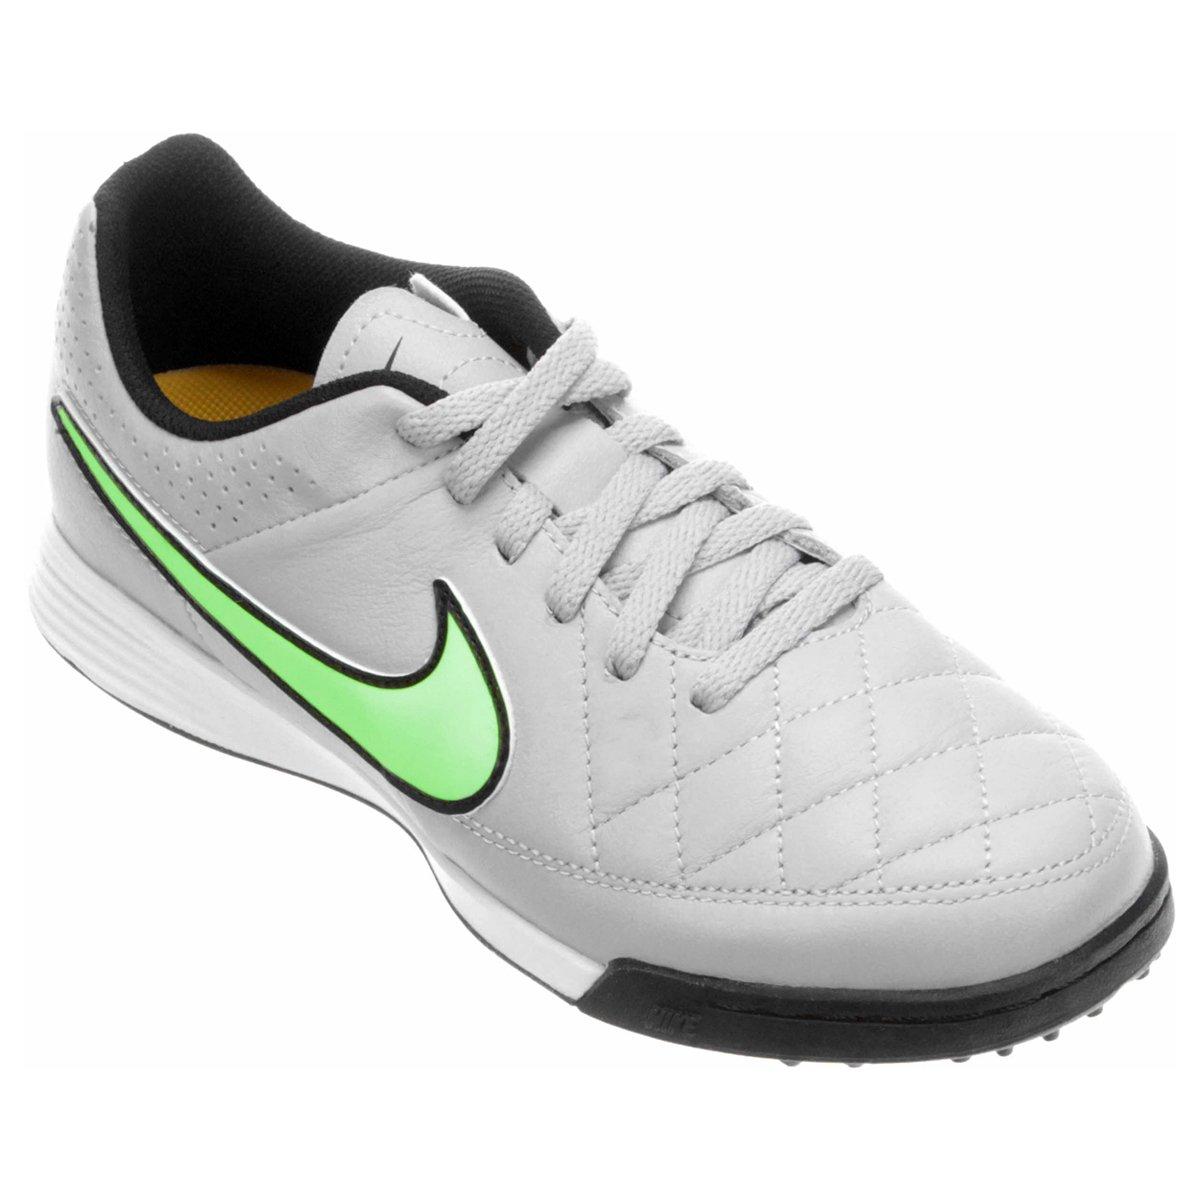 877a83962f Chuteira Nike Tiempo Gênio Leather TF Society Infantil - Compre Agora